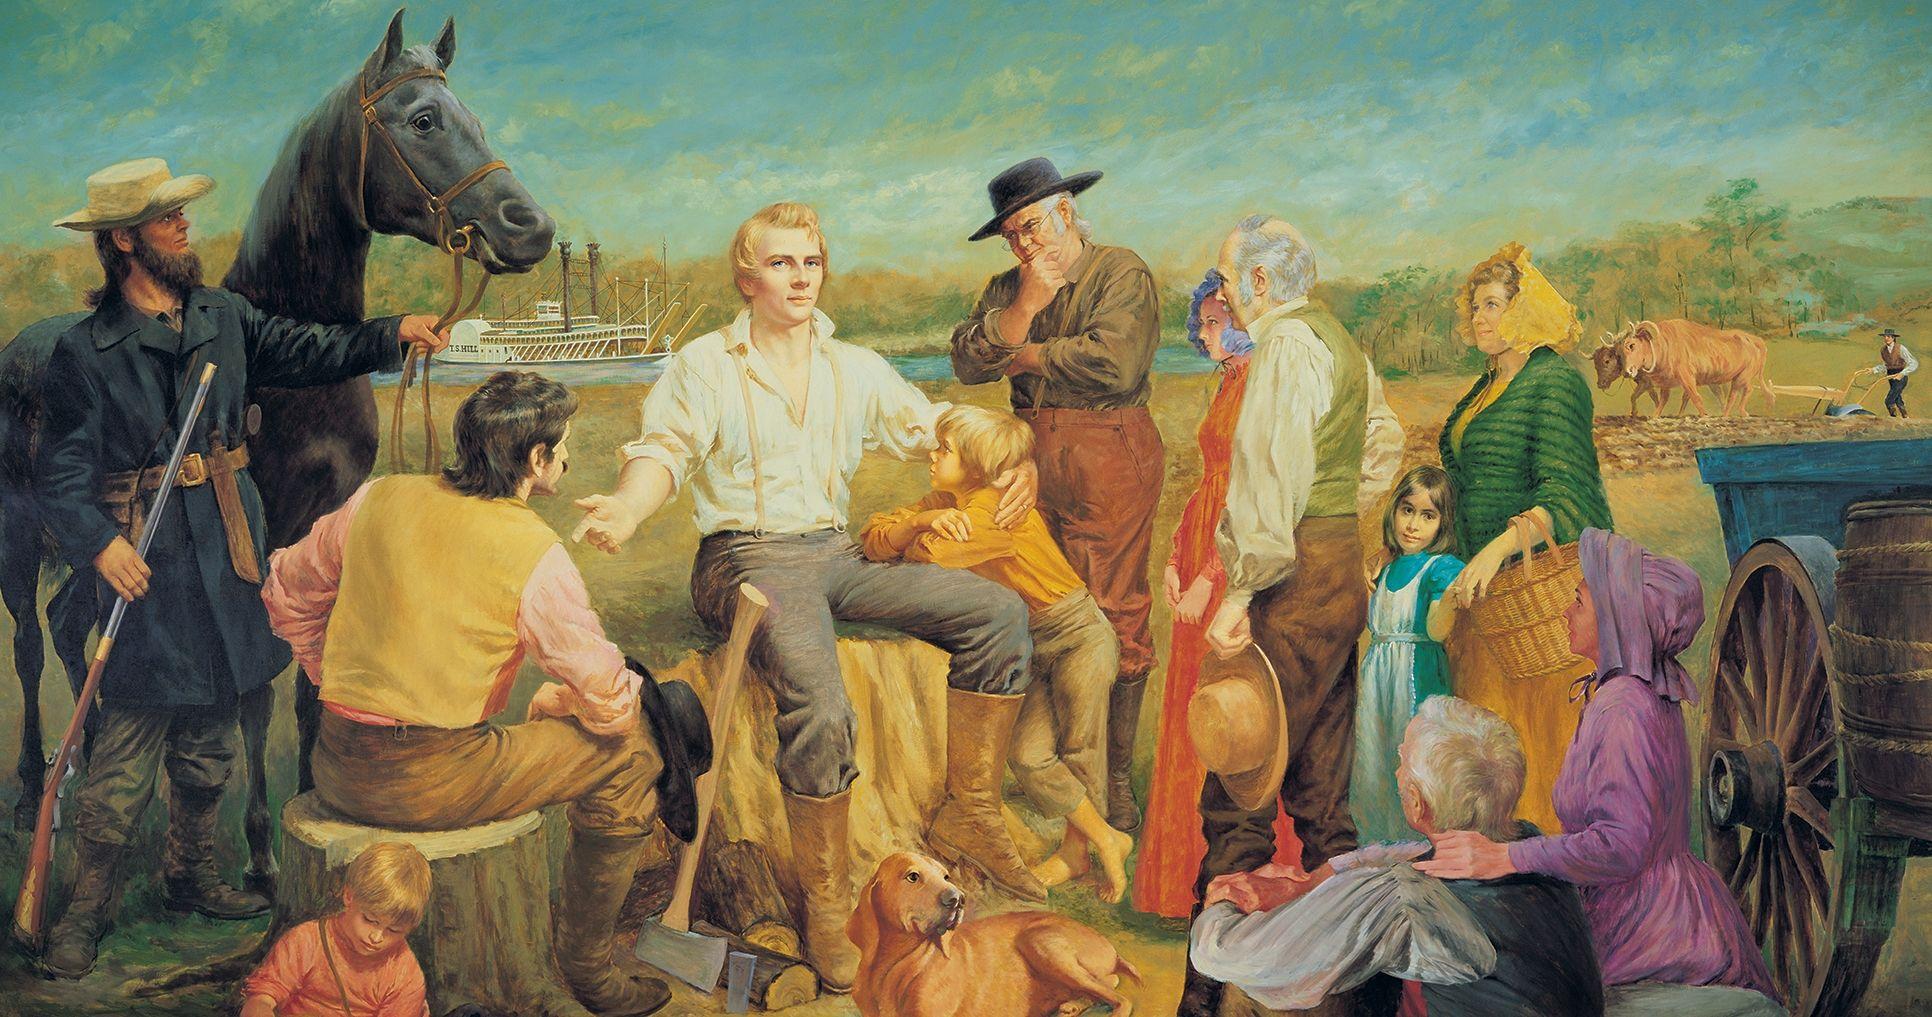 Joseph Smith in Nauvoo, 1840, by Theodore Gorka. Image via Church of Jesus Christ.